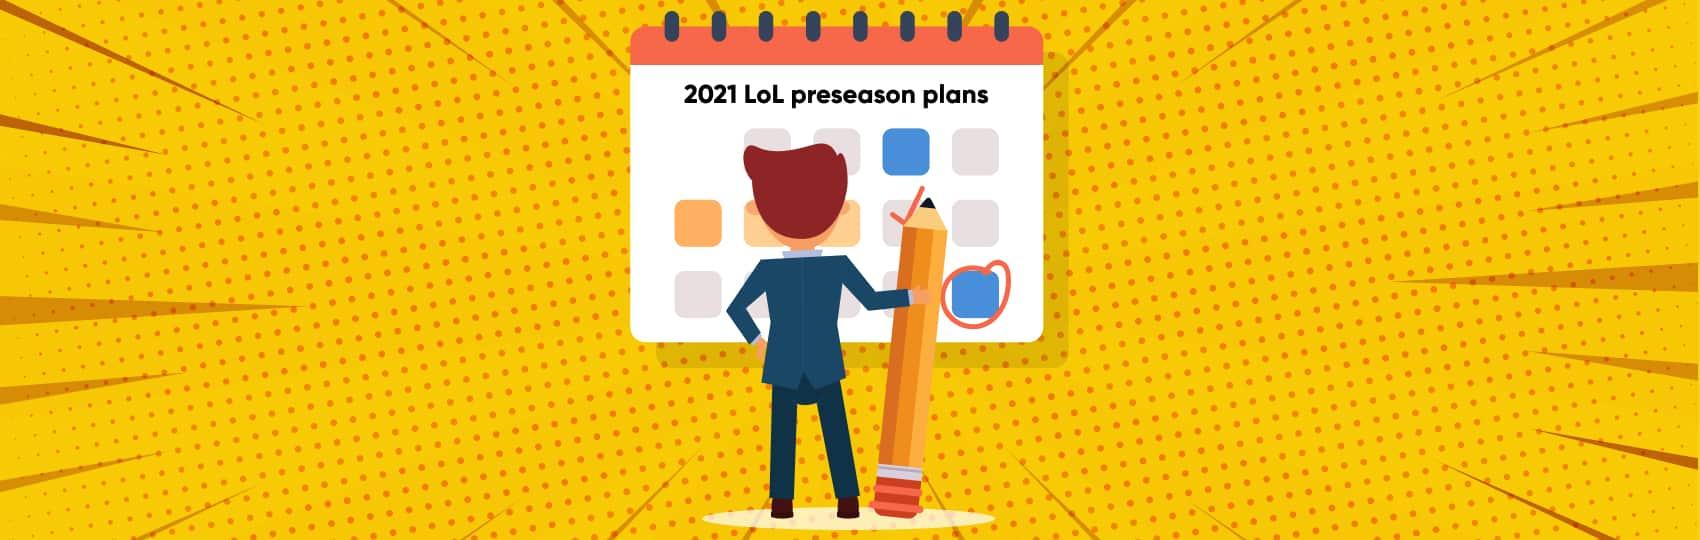 2021 LoL preseason plans: Class Item Goals